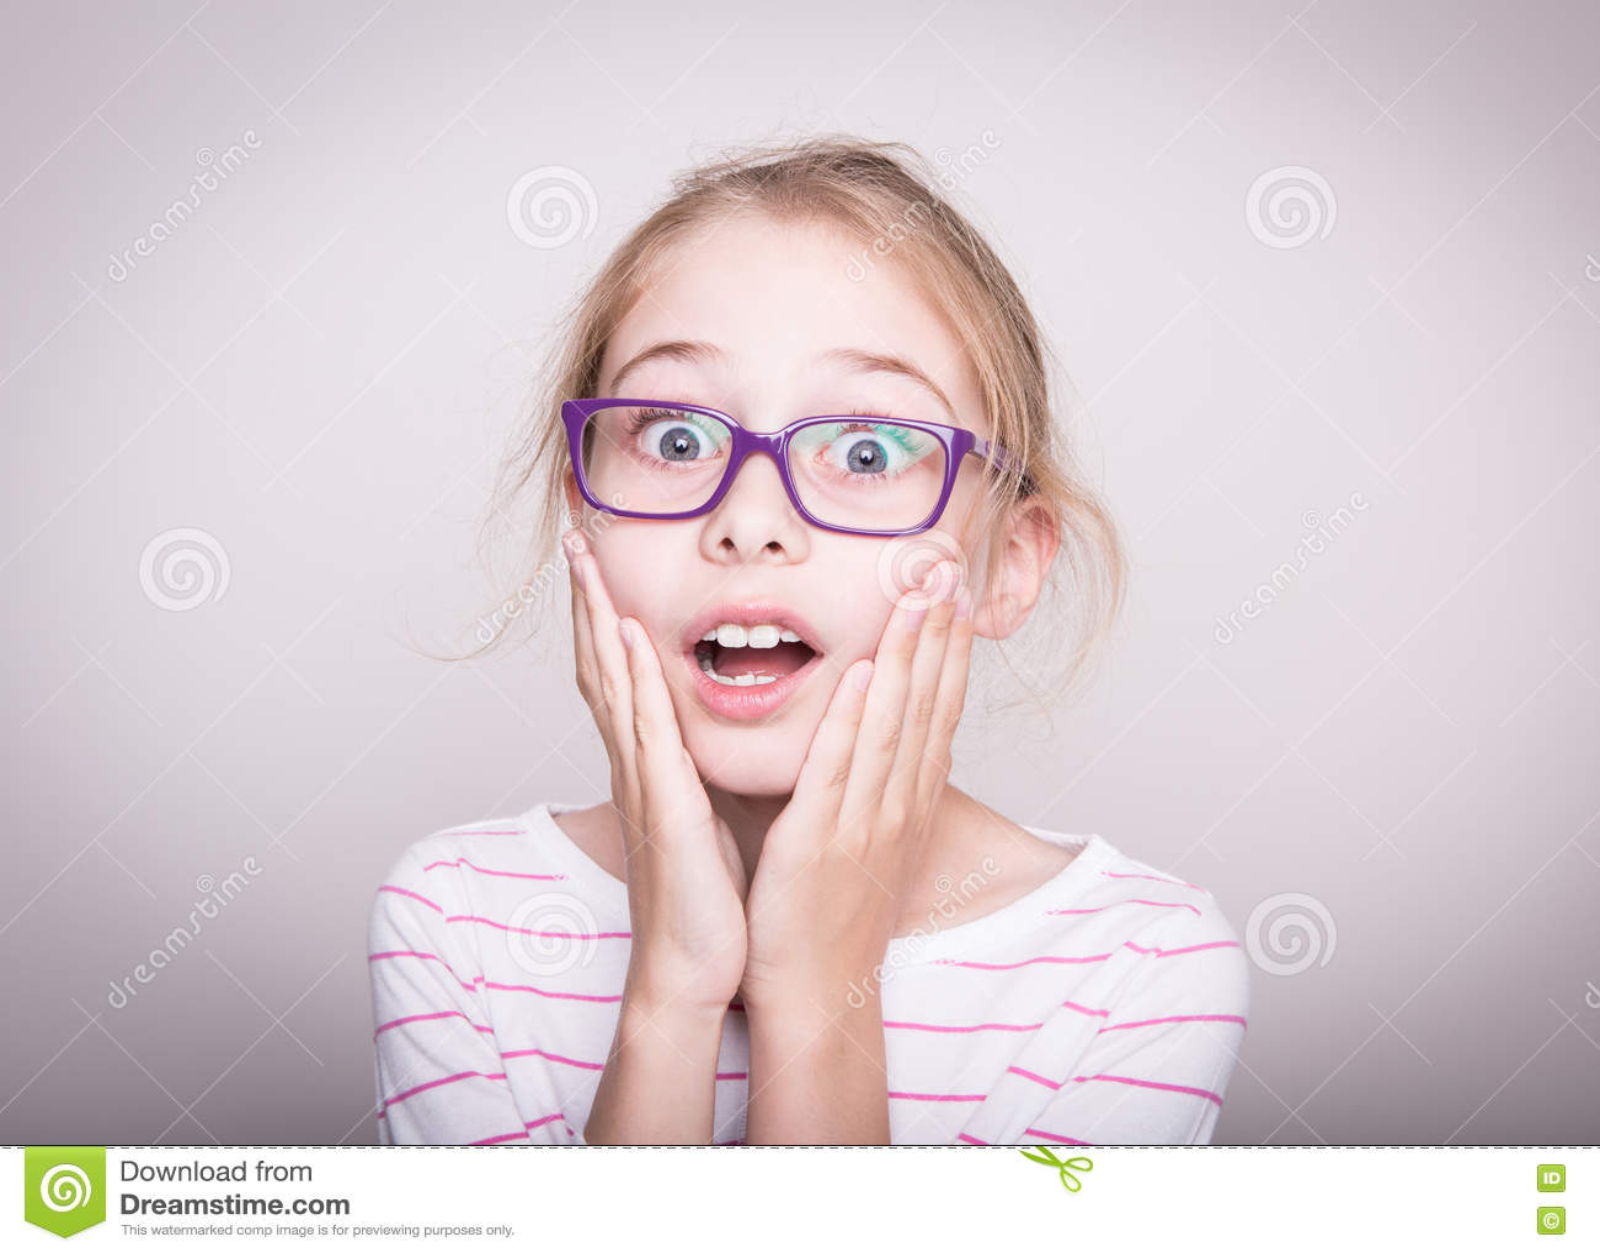 Surprised or shocked face of child girl in violet glasses